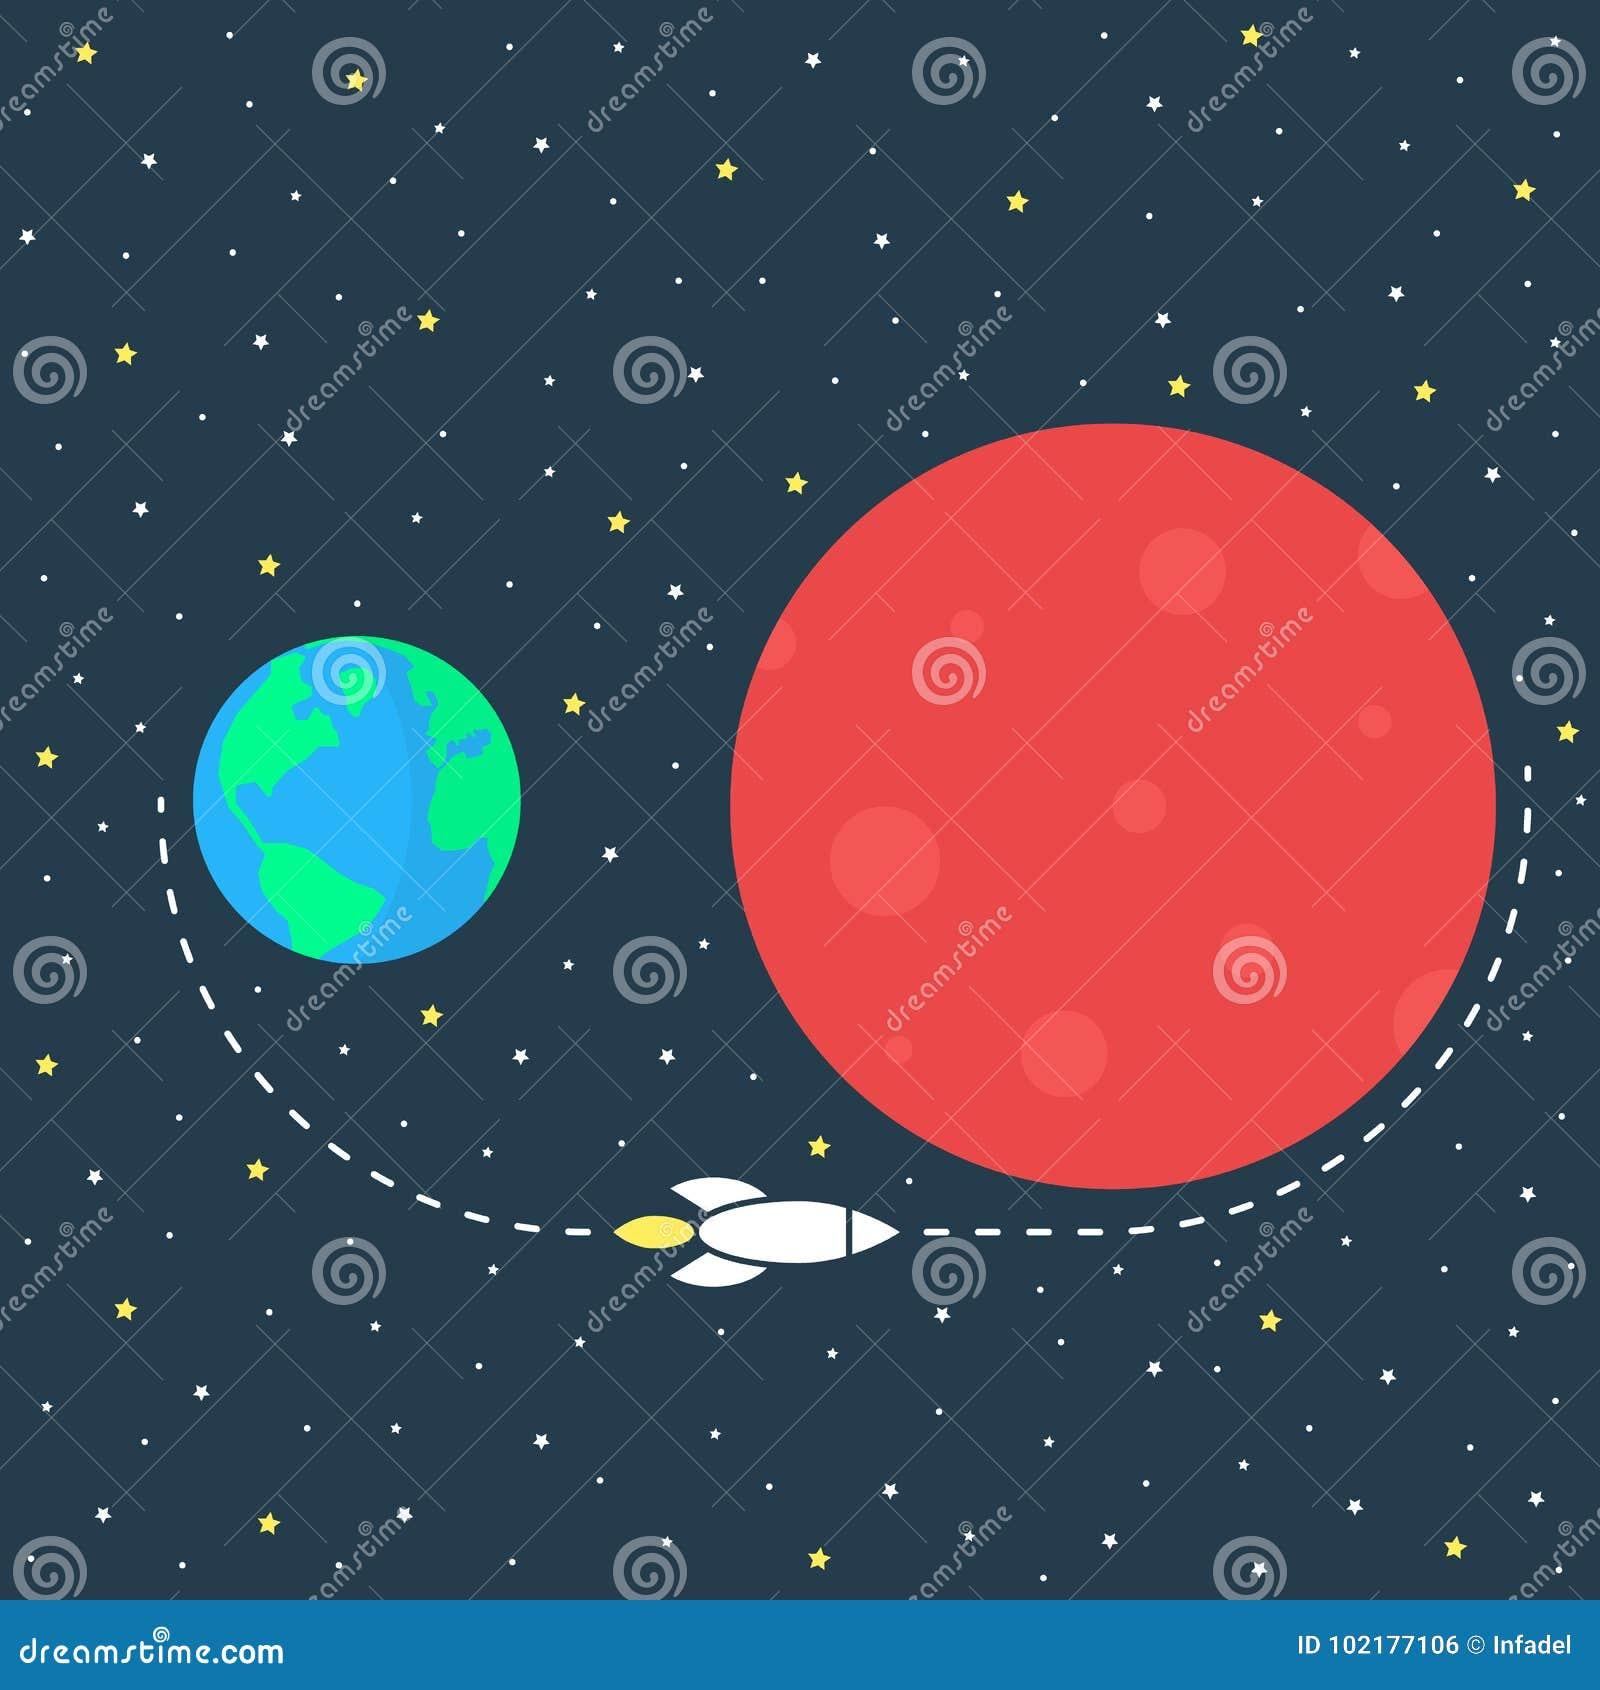 Simple Mission To Mars Image Stock Vector Illustration Of Orbit